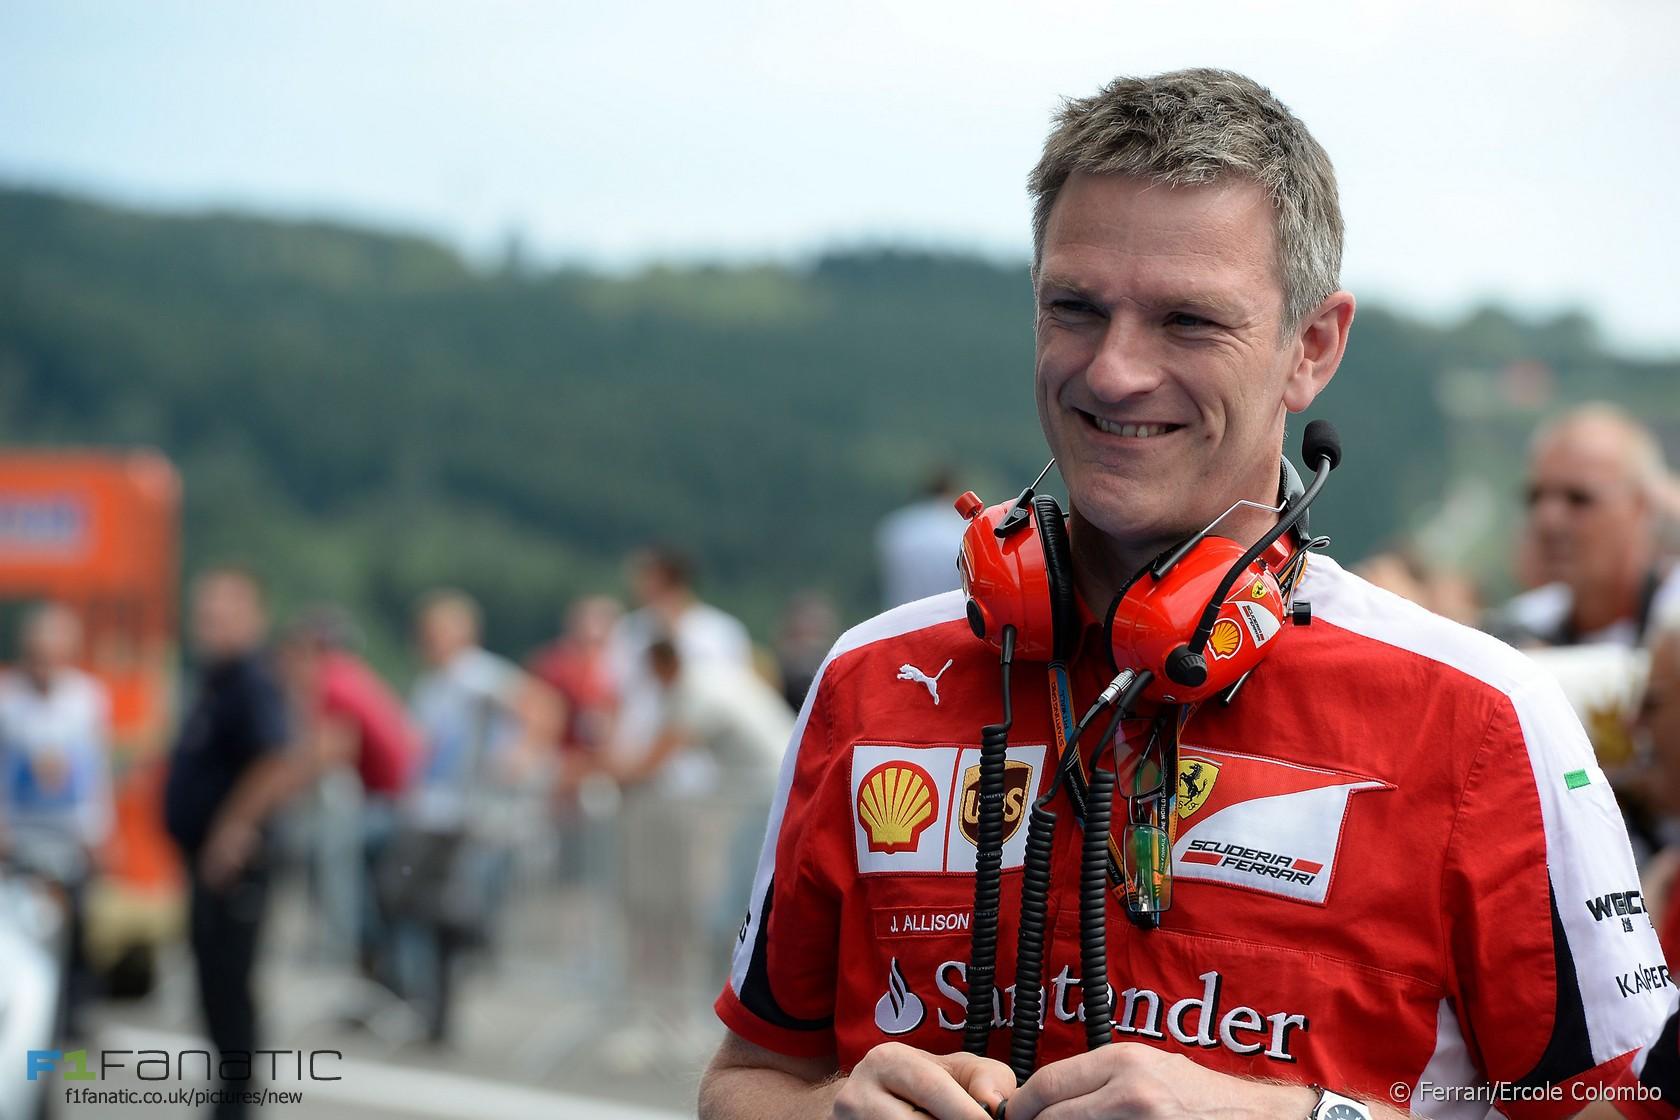 James Allison, Ferrari, Spa-Francorchamps, 2015